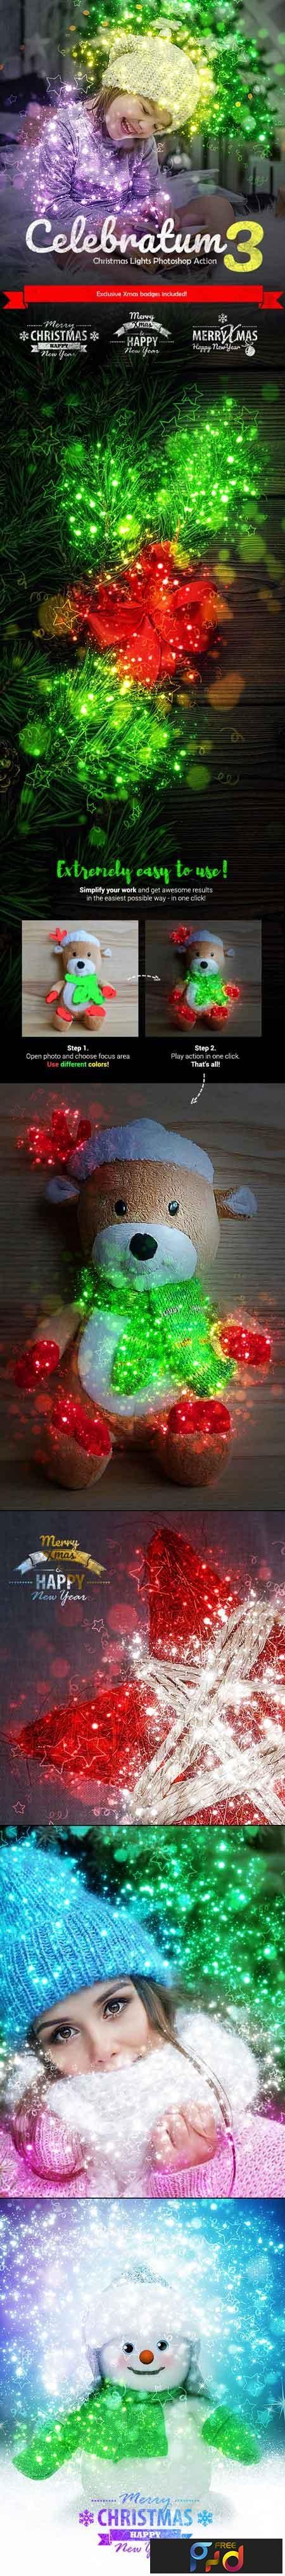 Celebratum 3 - Christmas Lights Photoshop Action 22863016 1